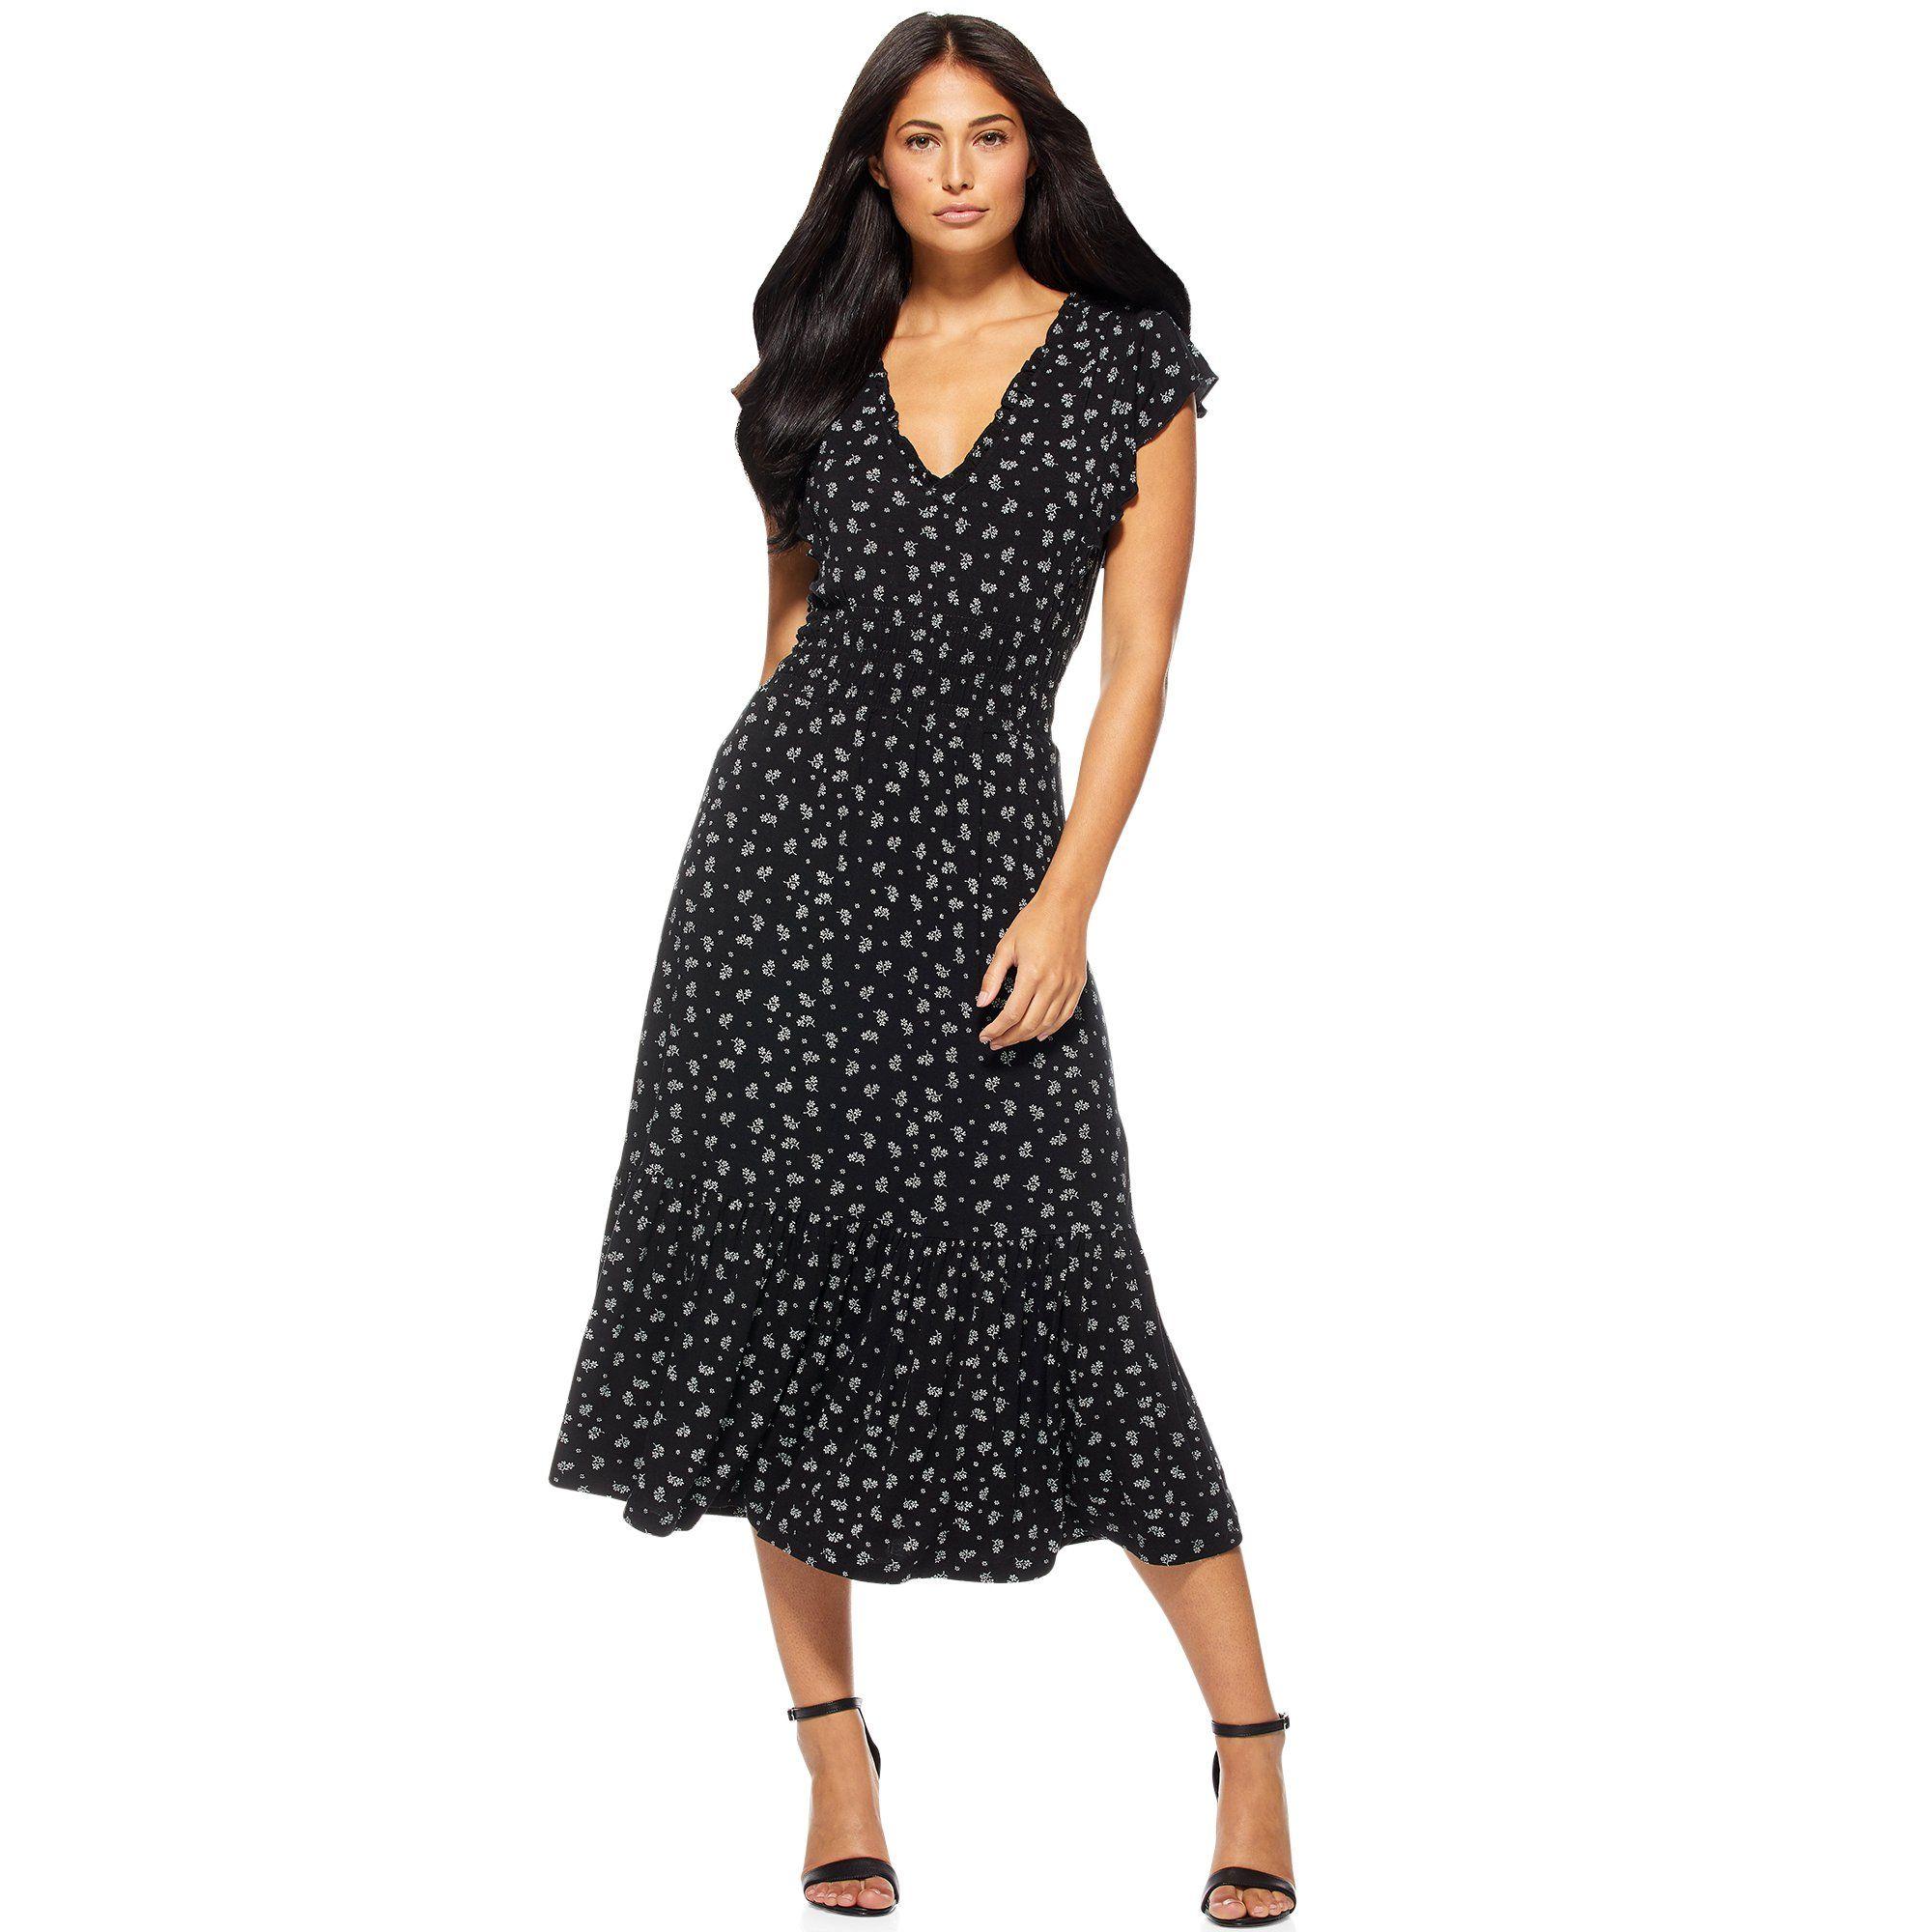 Sofia Vergara Sofia Jeans By Sofia Vergara Women S Short Sleeve Smocked Waist Midi Dress Walmart Com Walmar Womens Midi Dresses Midi Dress Womens Dresses [ 2000 x 2000 Pixel ]